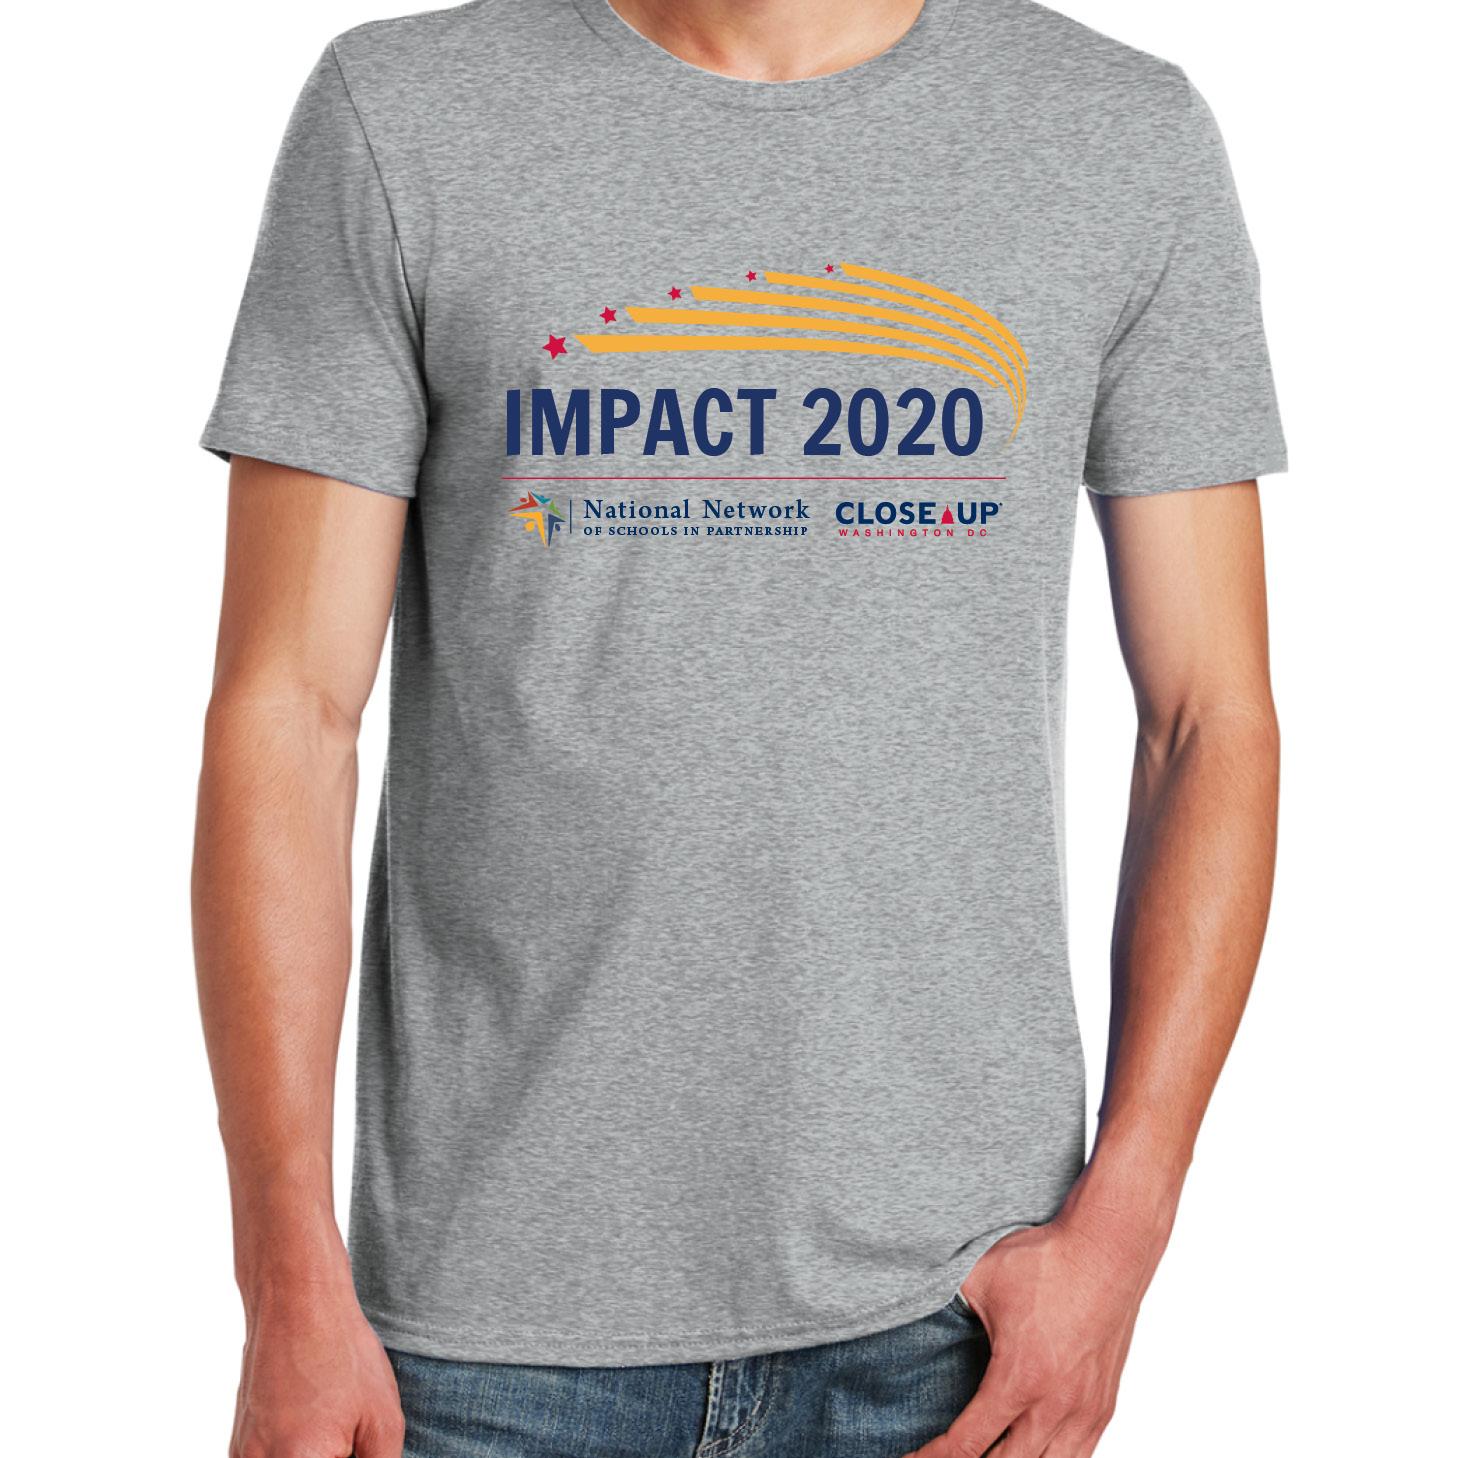 Unisex All-American Tee - Ath Hthr - Impact Logo